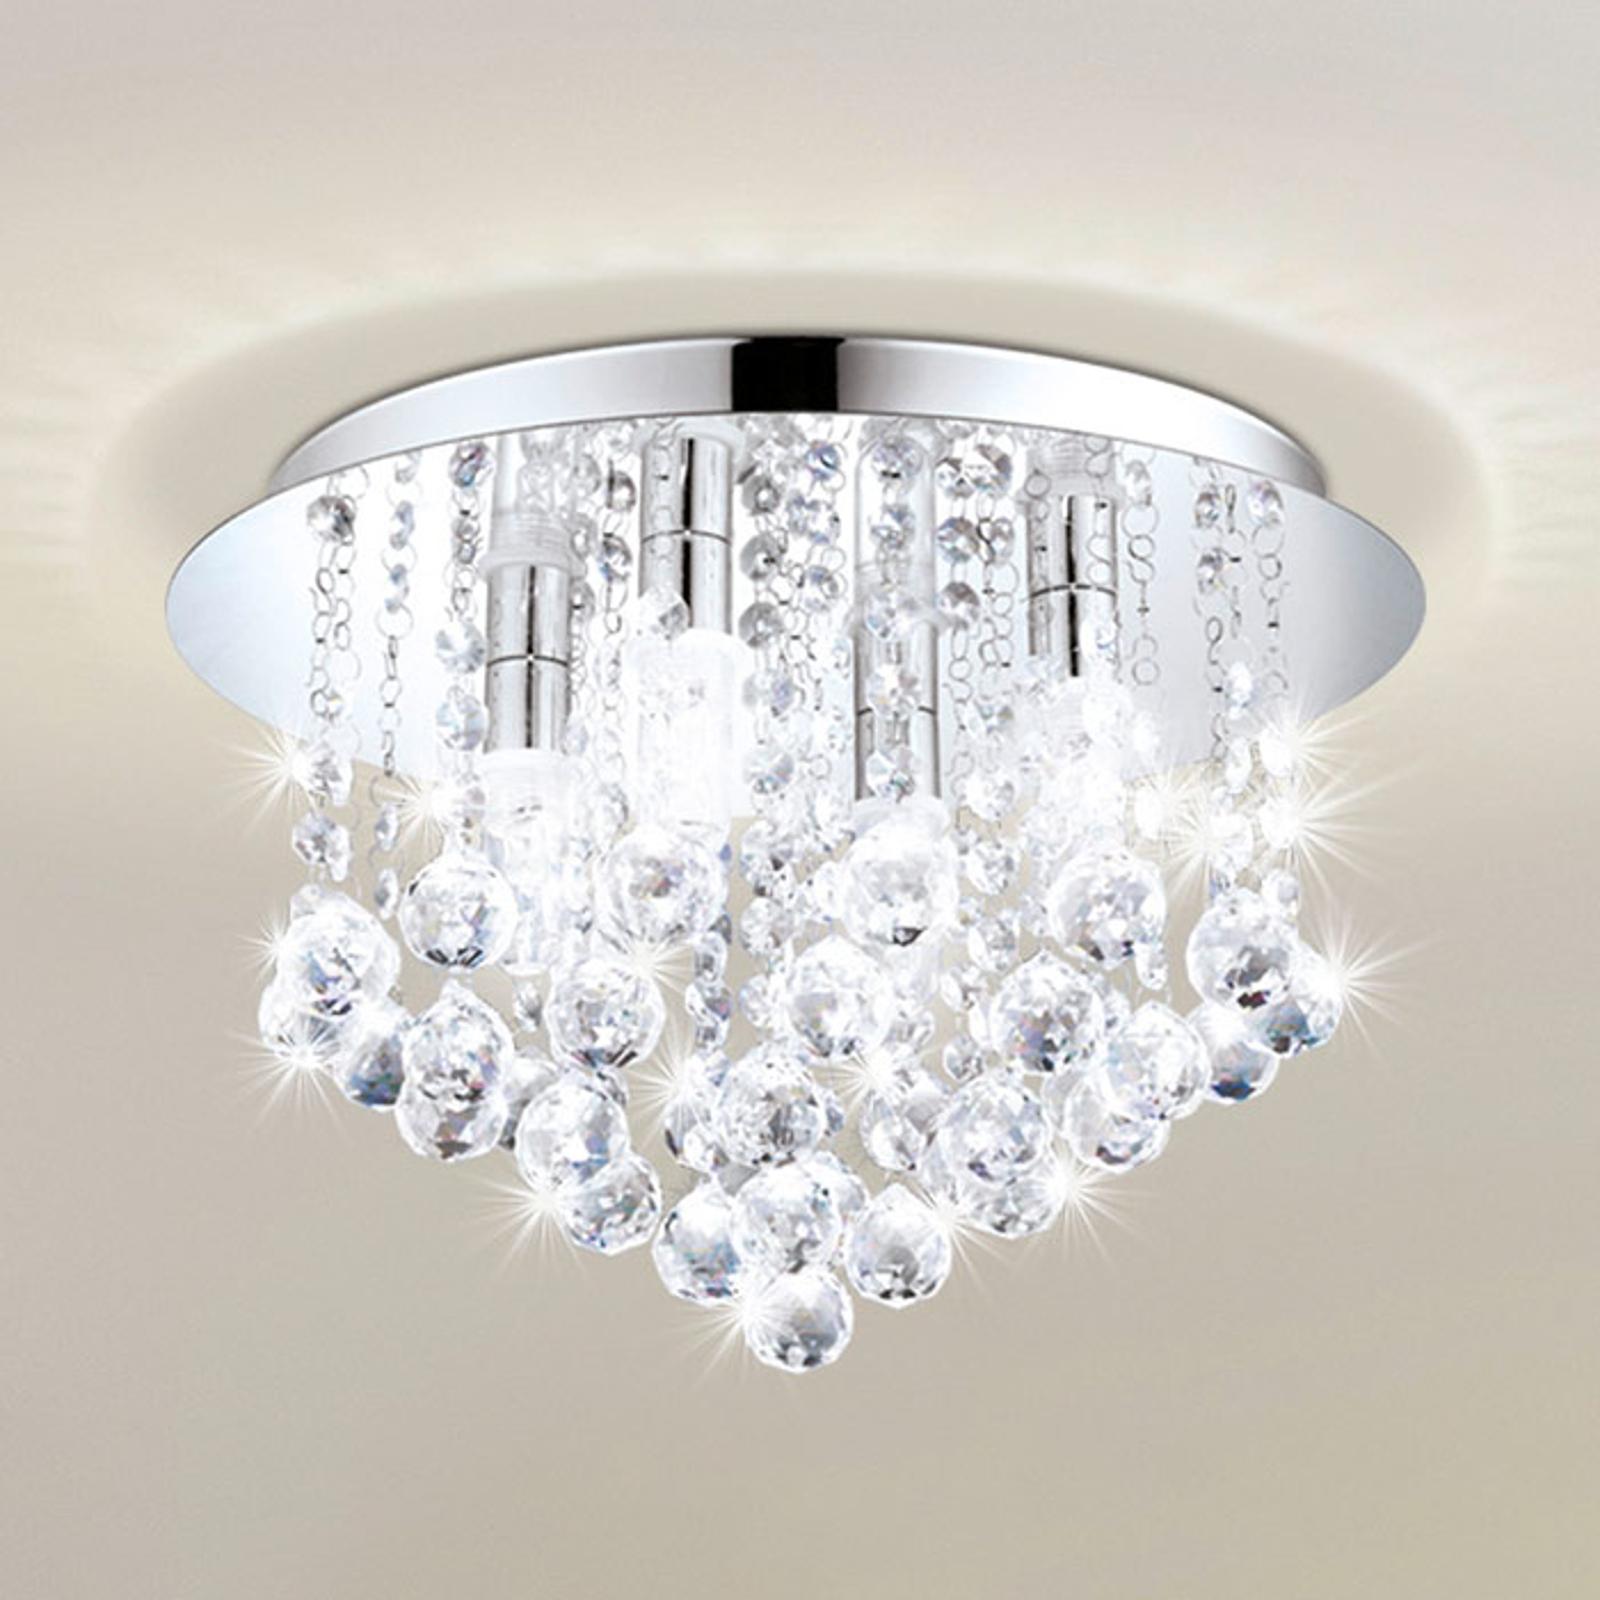 LED-taklampe Almonte med forheng 35 cm